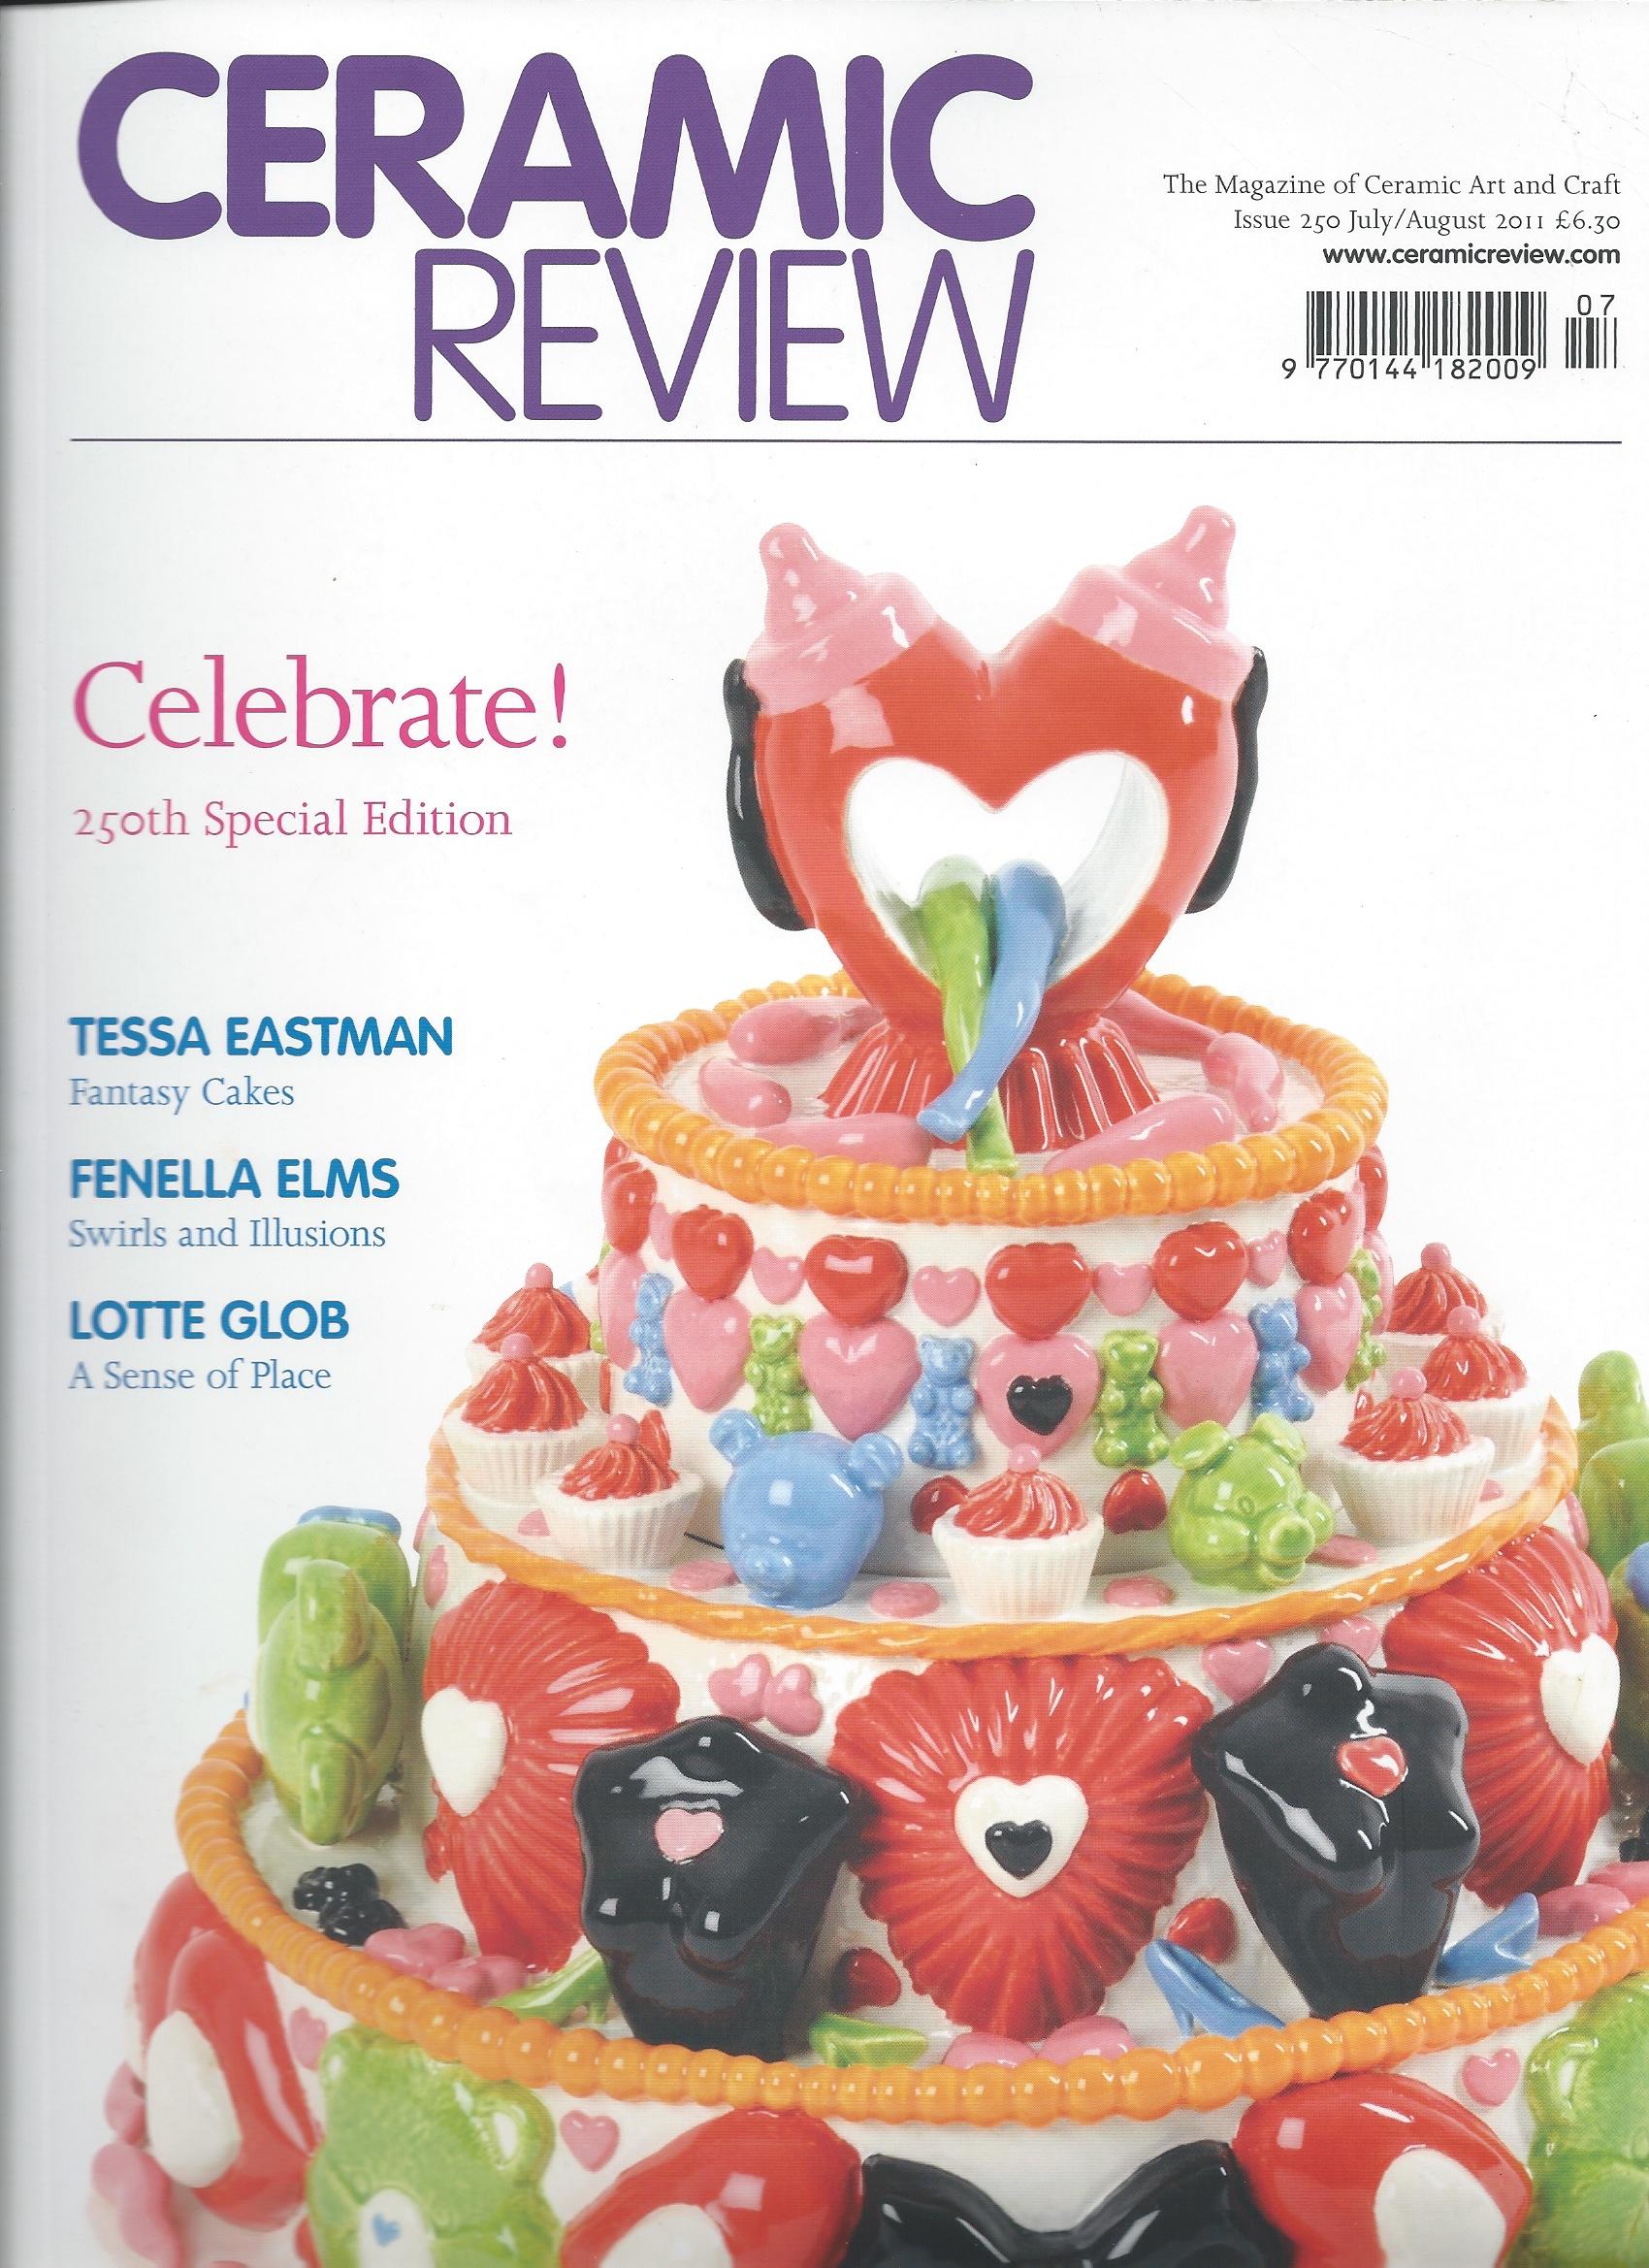 >> Ceramic Review 2011